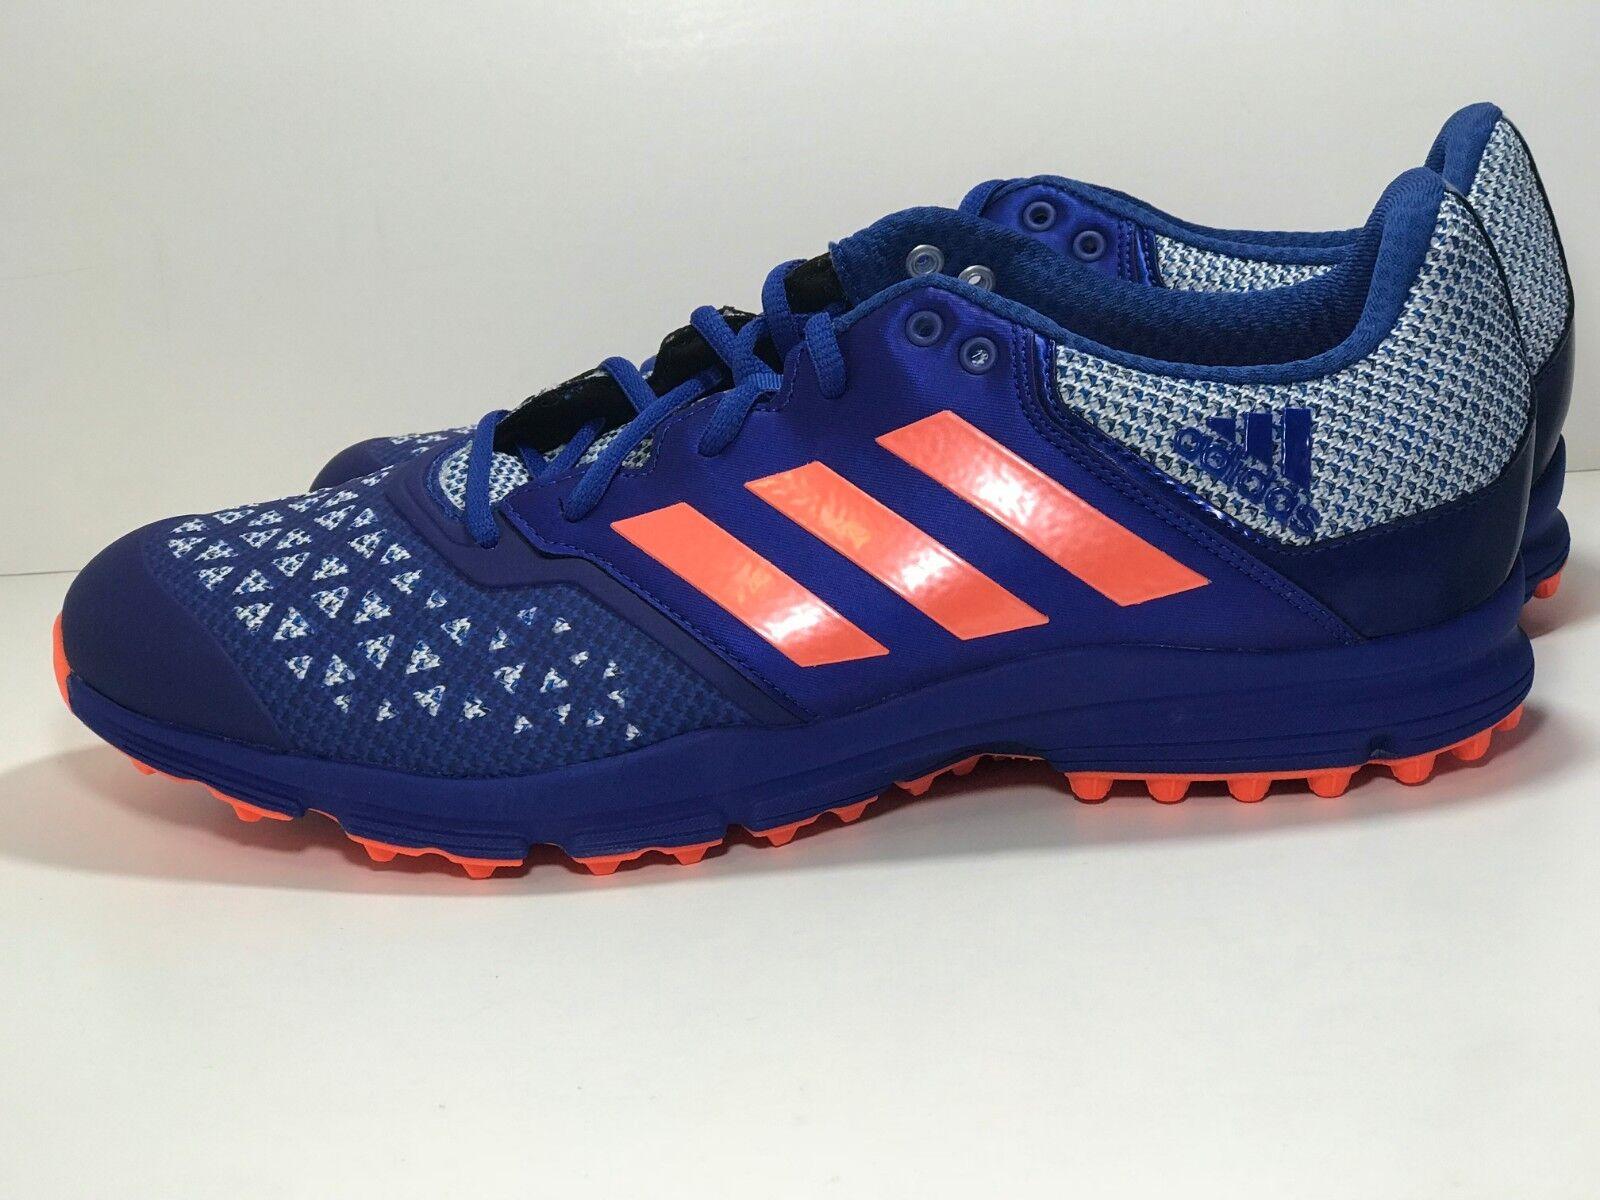 Adidas Zone Dox Hockey shoes bluee orange Trainers Cleats AQ6520 Men's Size 12